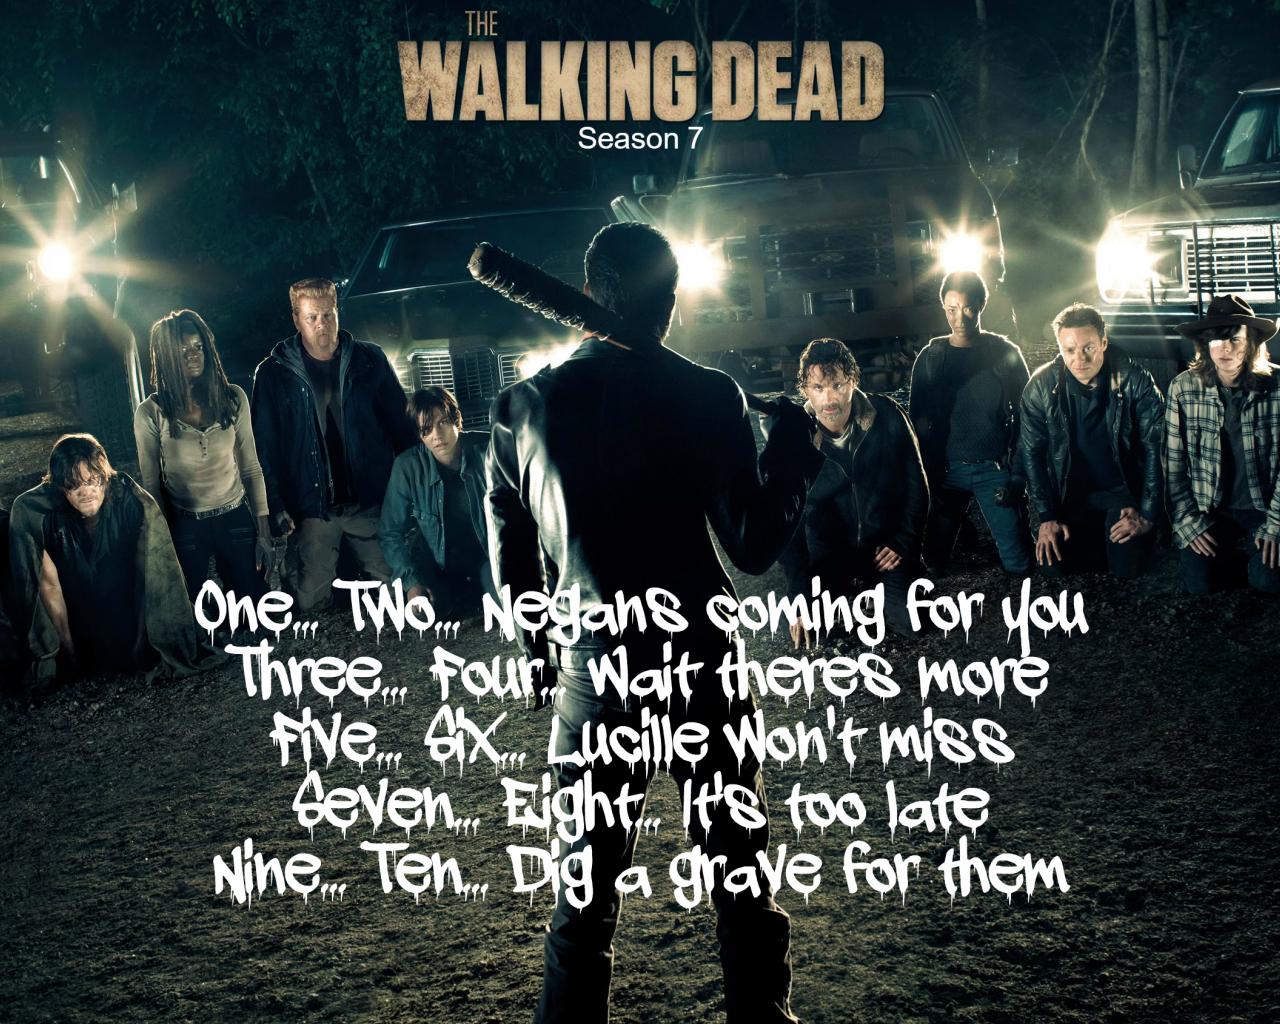 Free Download The Walking Dead Negan Wallpaper Hd Wallpapers